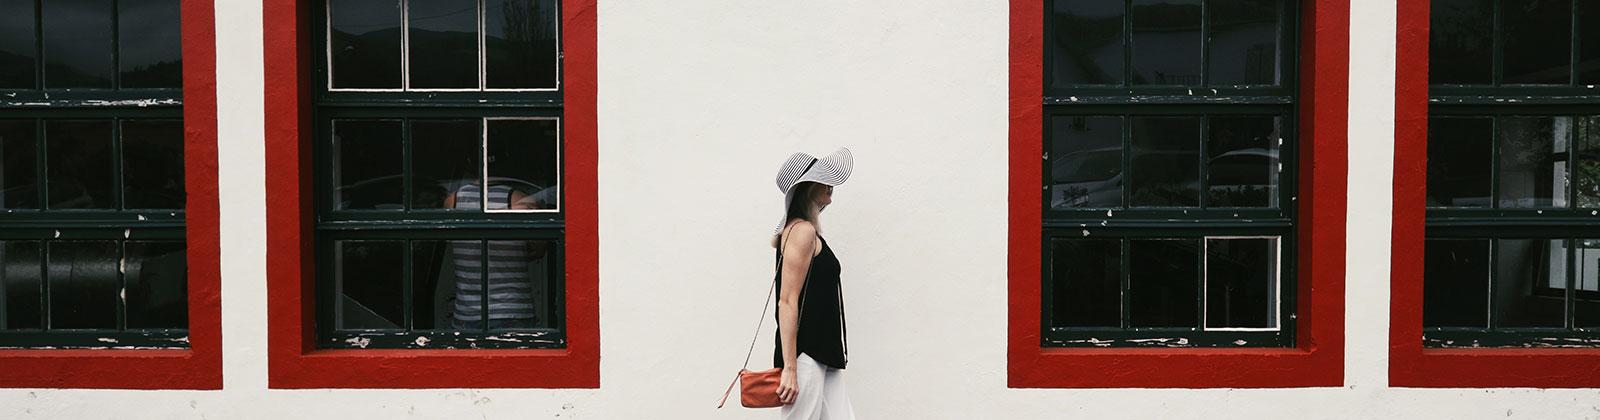 woman walking in front of windows